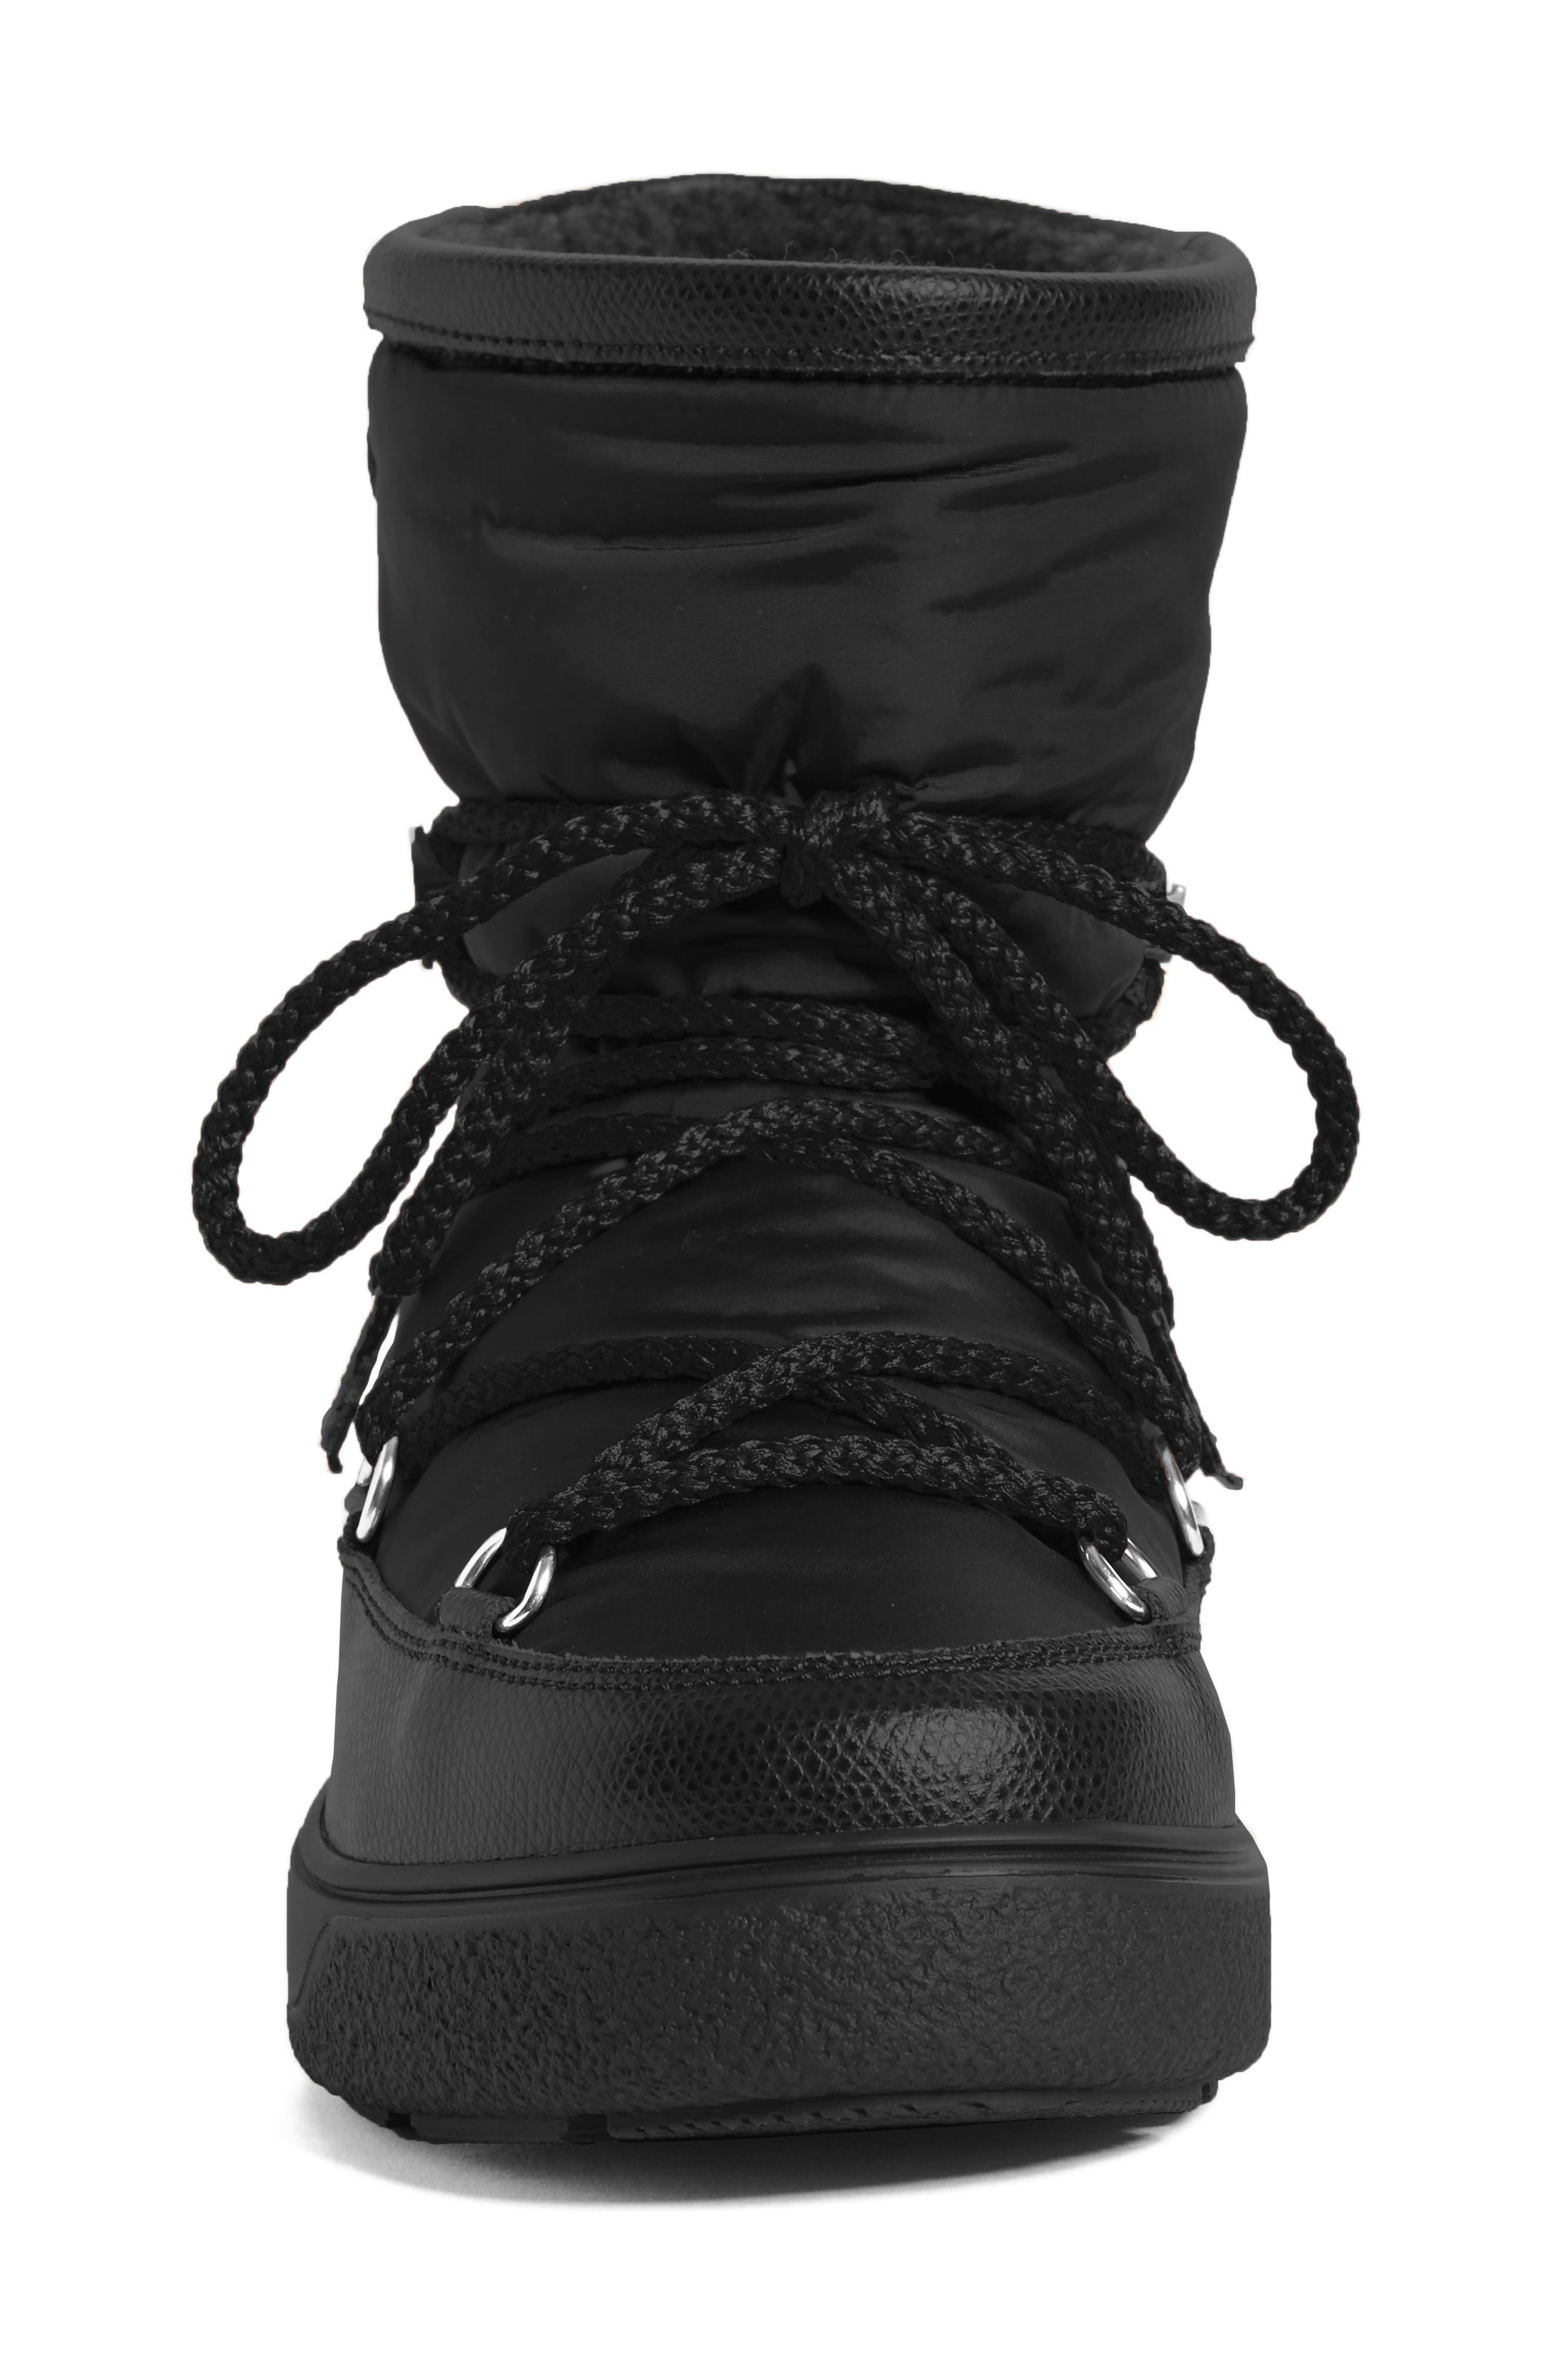 New Fanny Stivale Short Moon Boots,                             Alternate thumbnail 4, color,                             Black